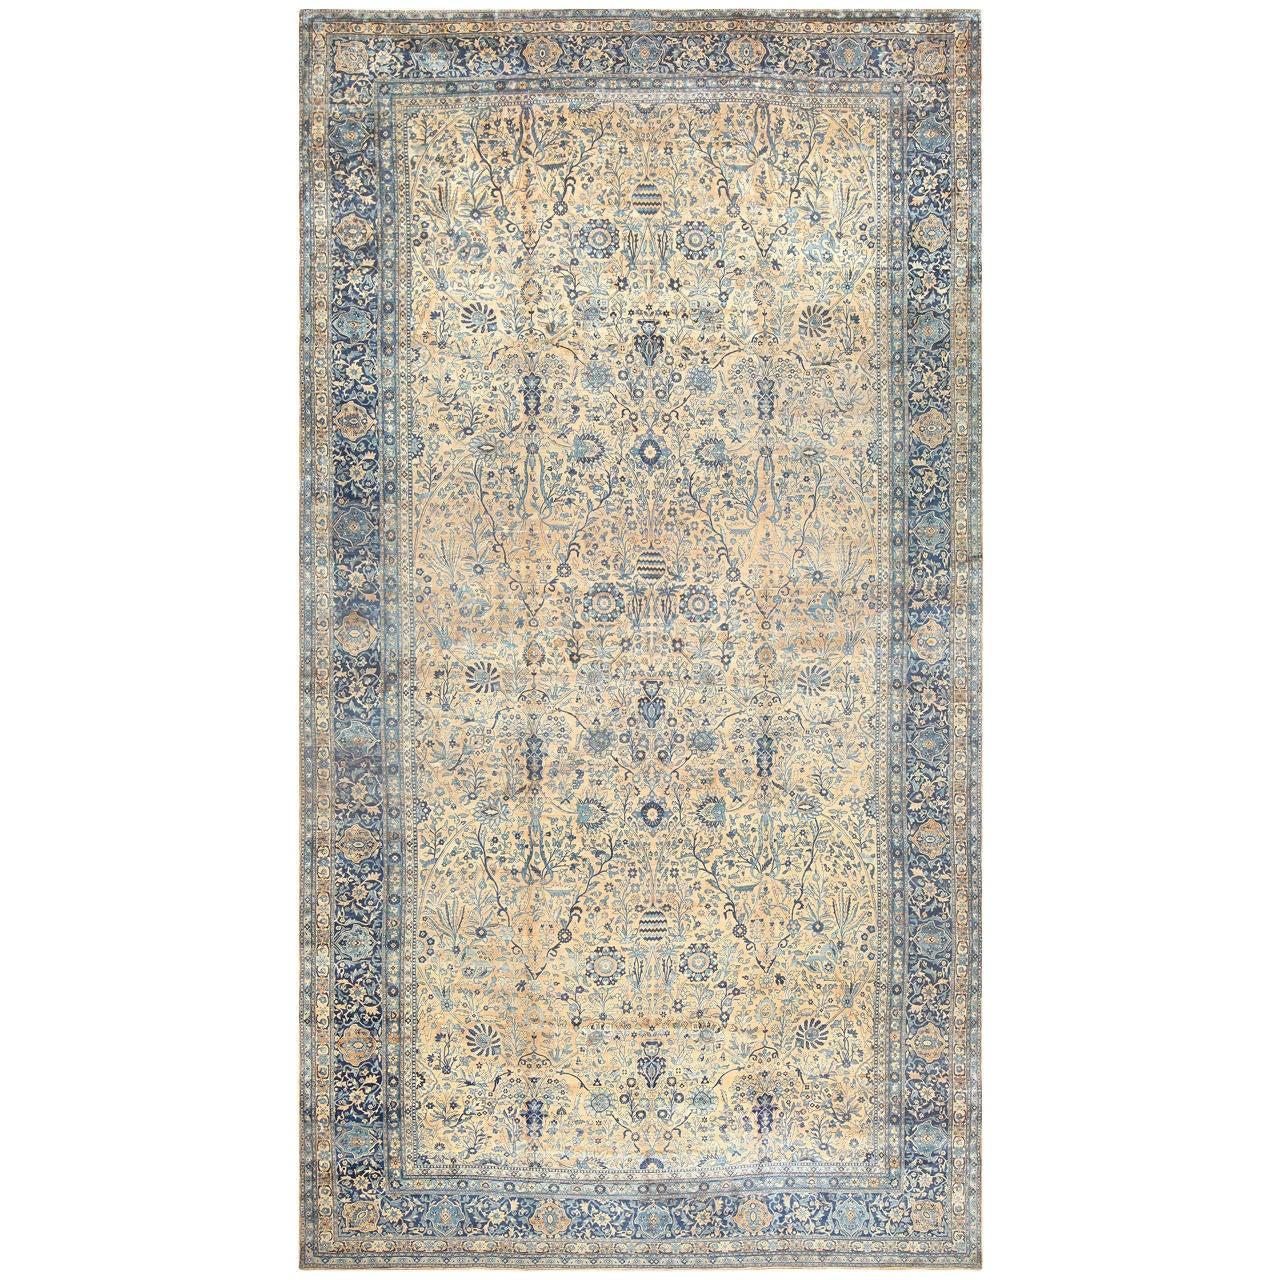 Fine Antique Oversized Vase Design Persian Kerman Carpet For